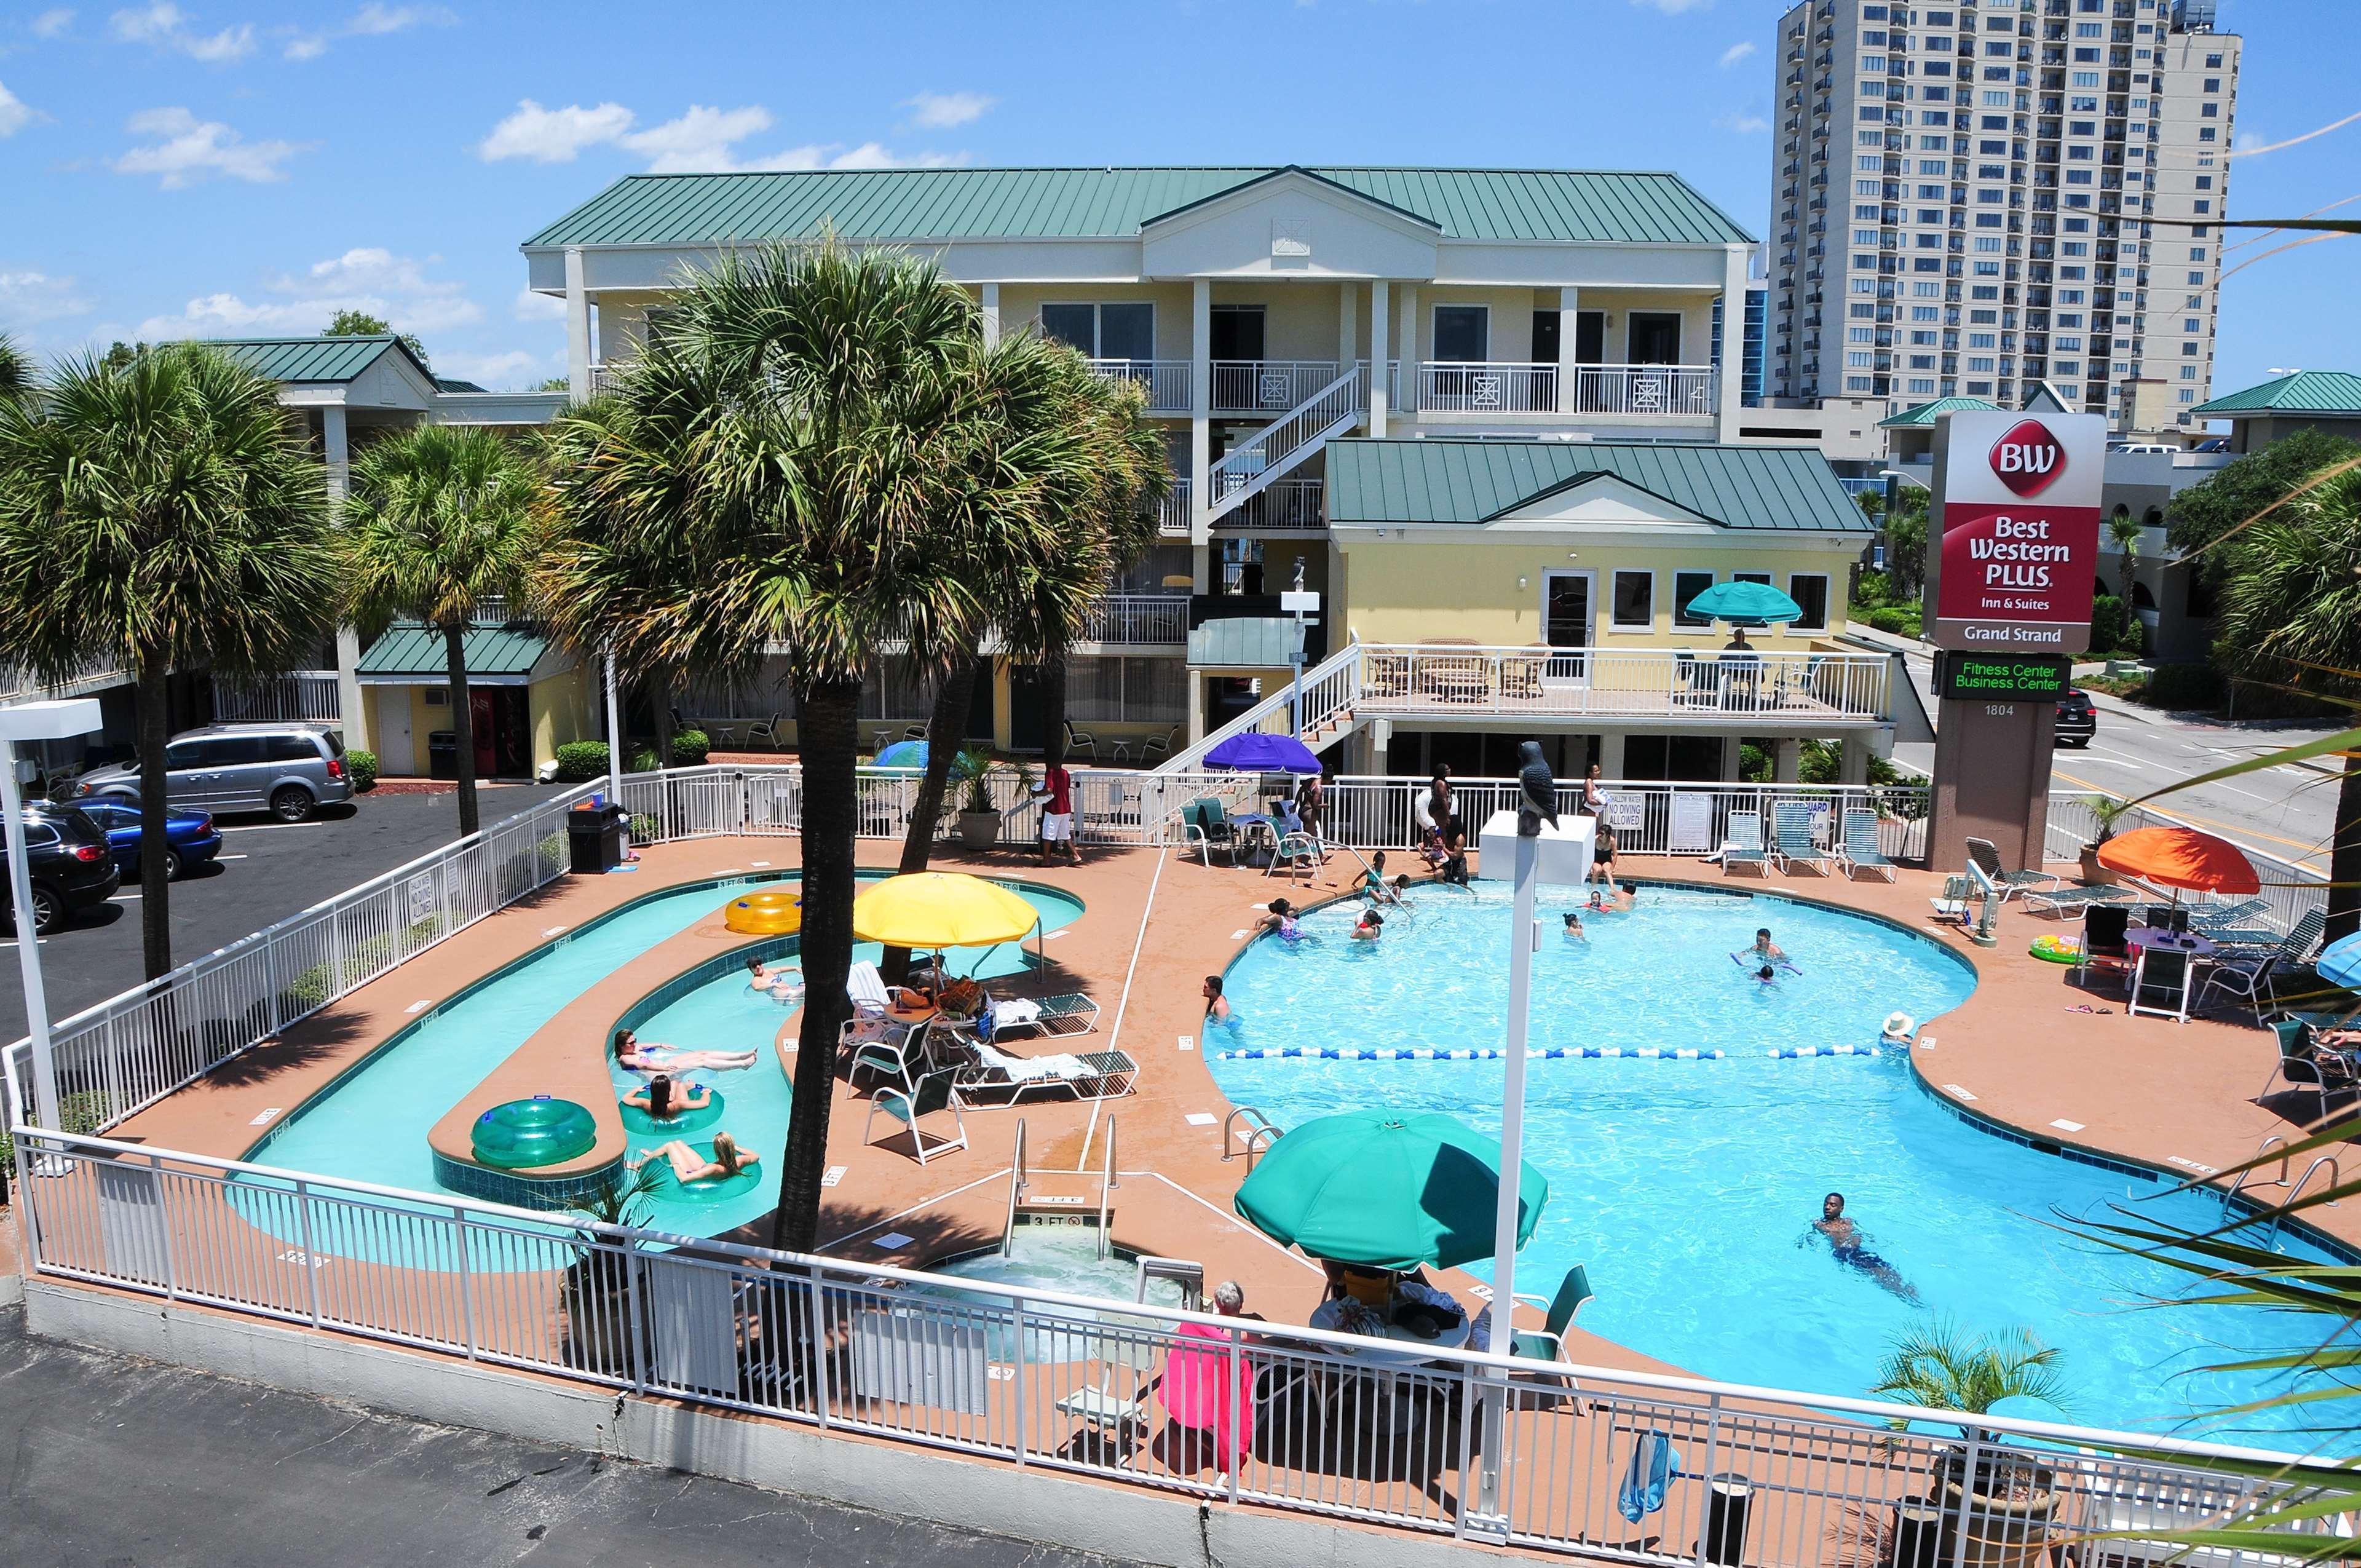 Best Western Plus Grand Strand Inn & Suites image 8